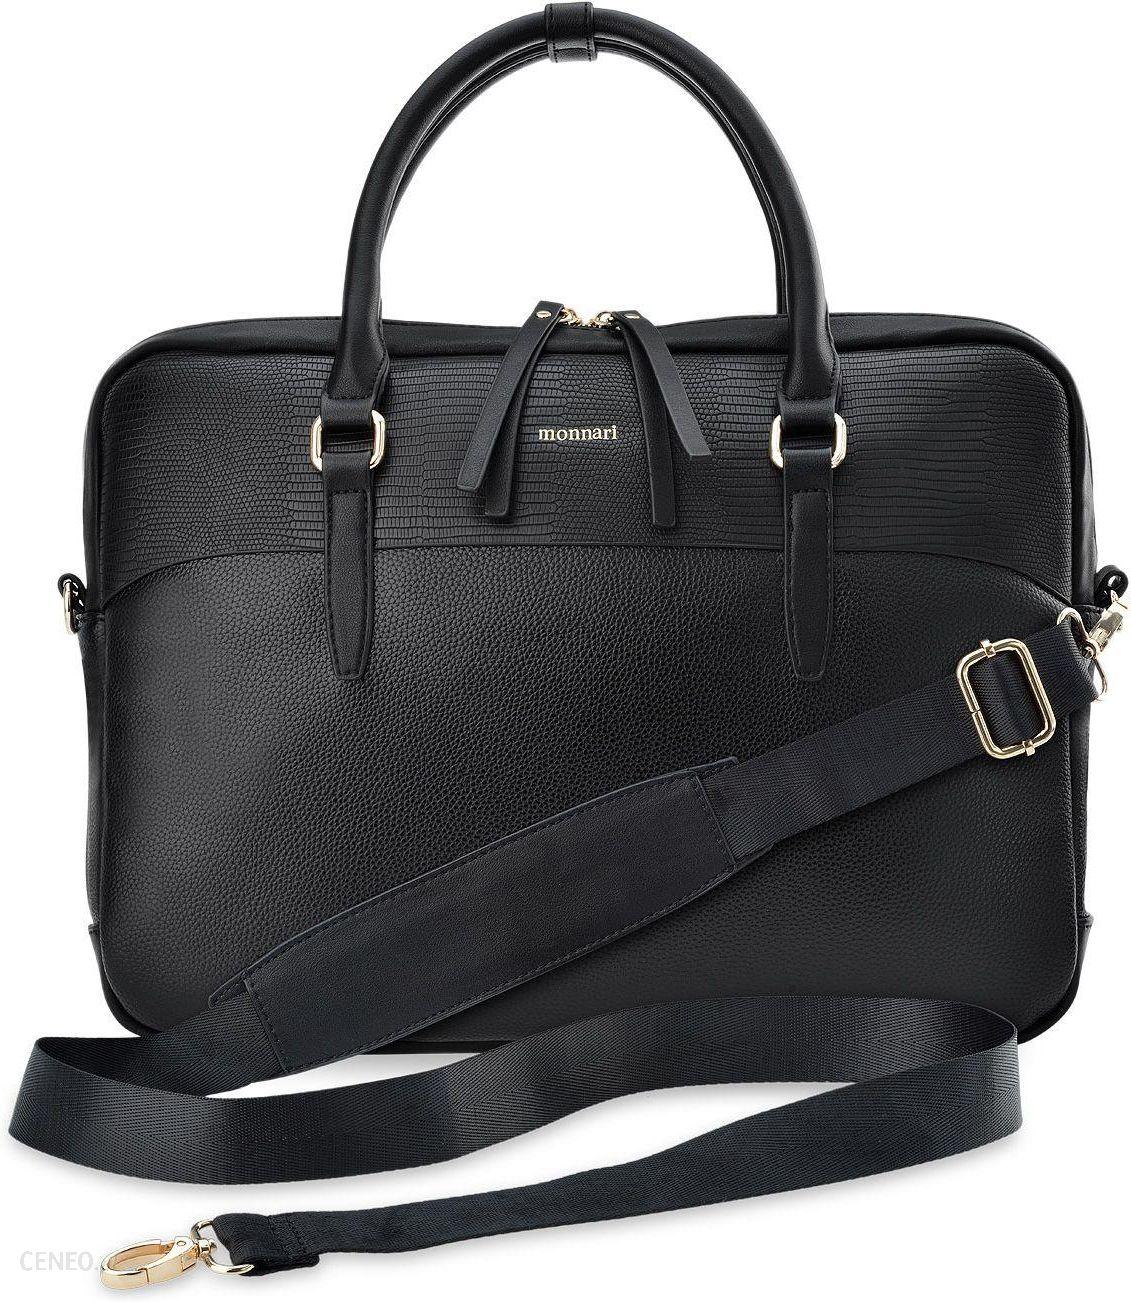 fe3651efe05a4 Stylowa torba na laptopa monnari teczka aktówka - czarny - Ceny i ...